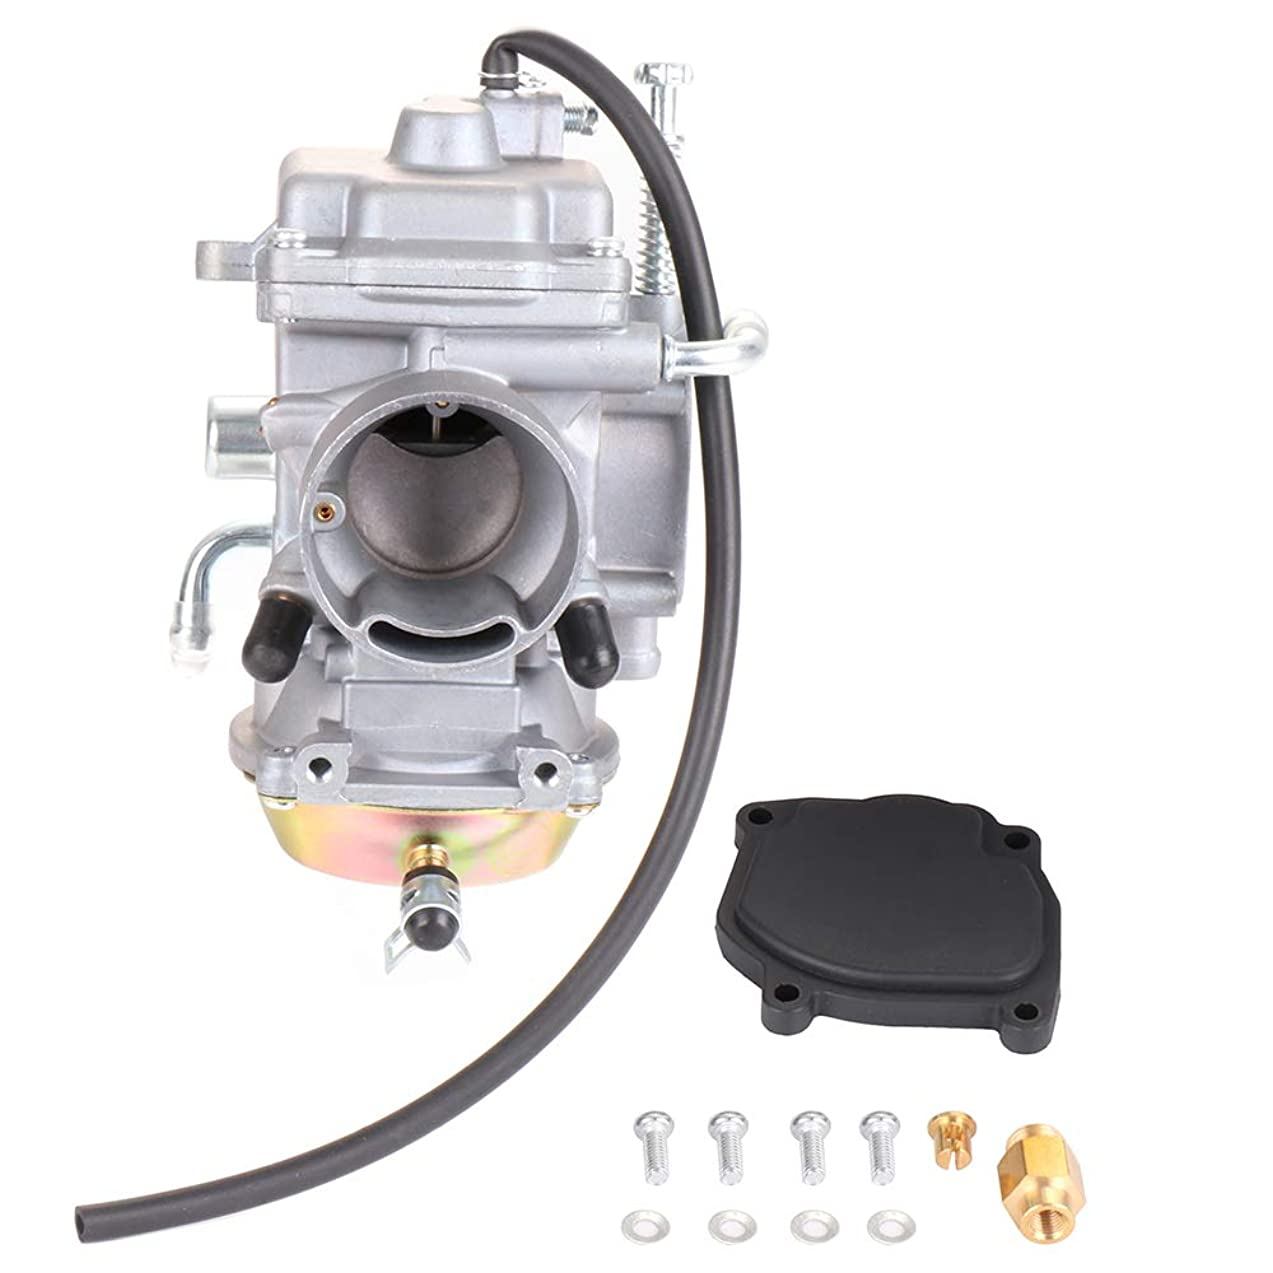 ECCPP New Replacement Carburetor Fit for Polaris Sportsman 500 1996-2008/Polaris Magnum 325 2000-2002/Polaris Magnum 425 1995-1998/Polaris Ranger 500 2001-2009